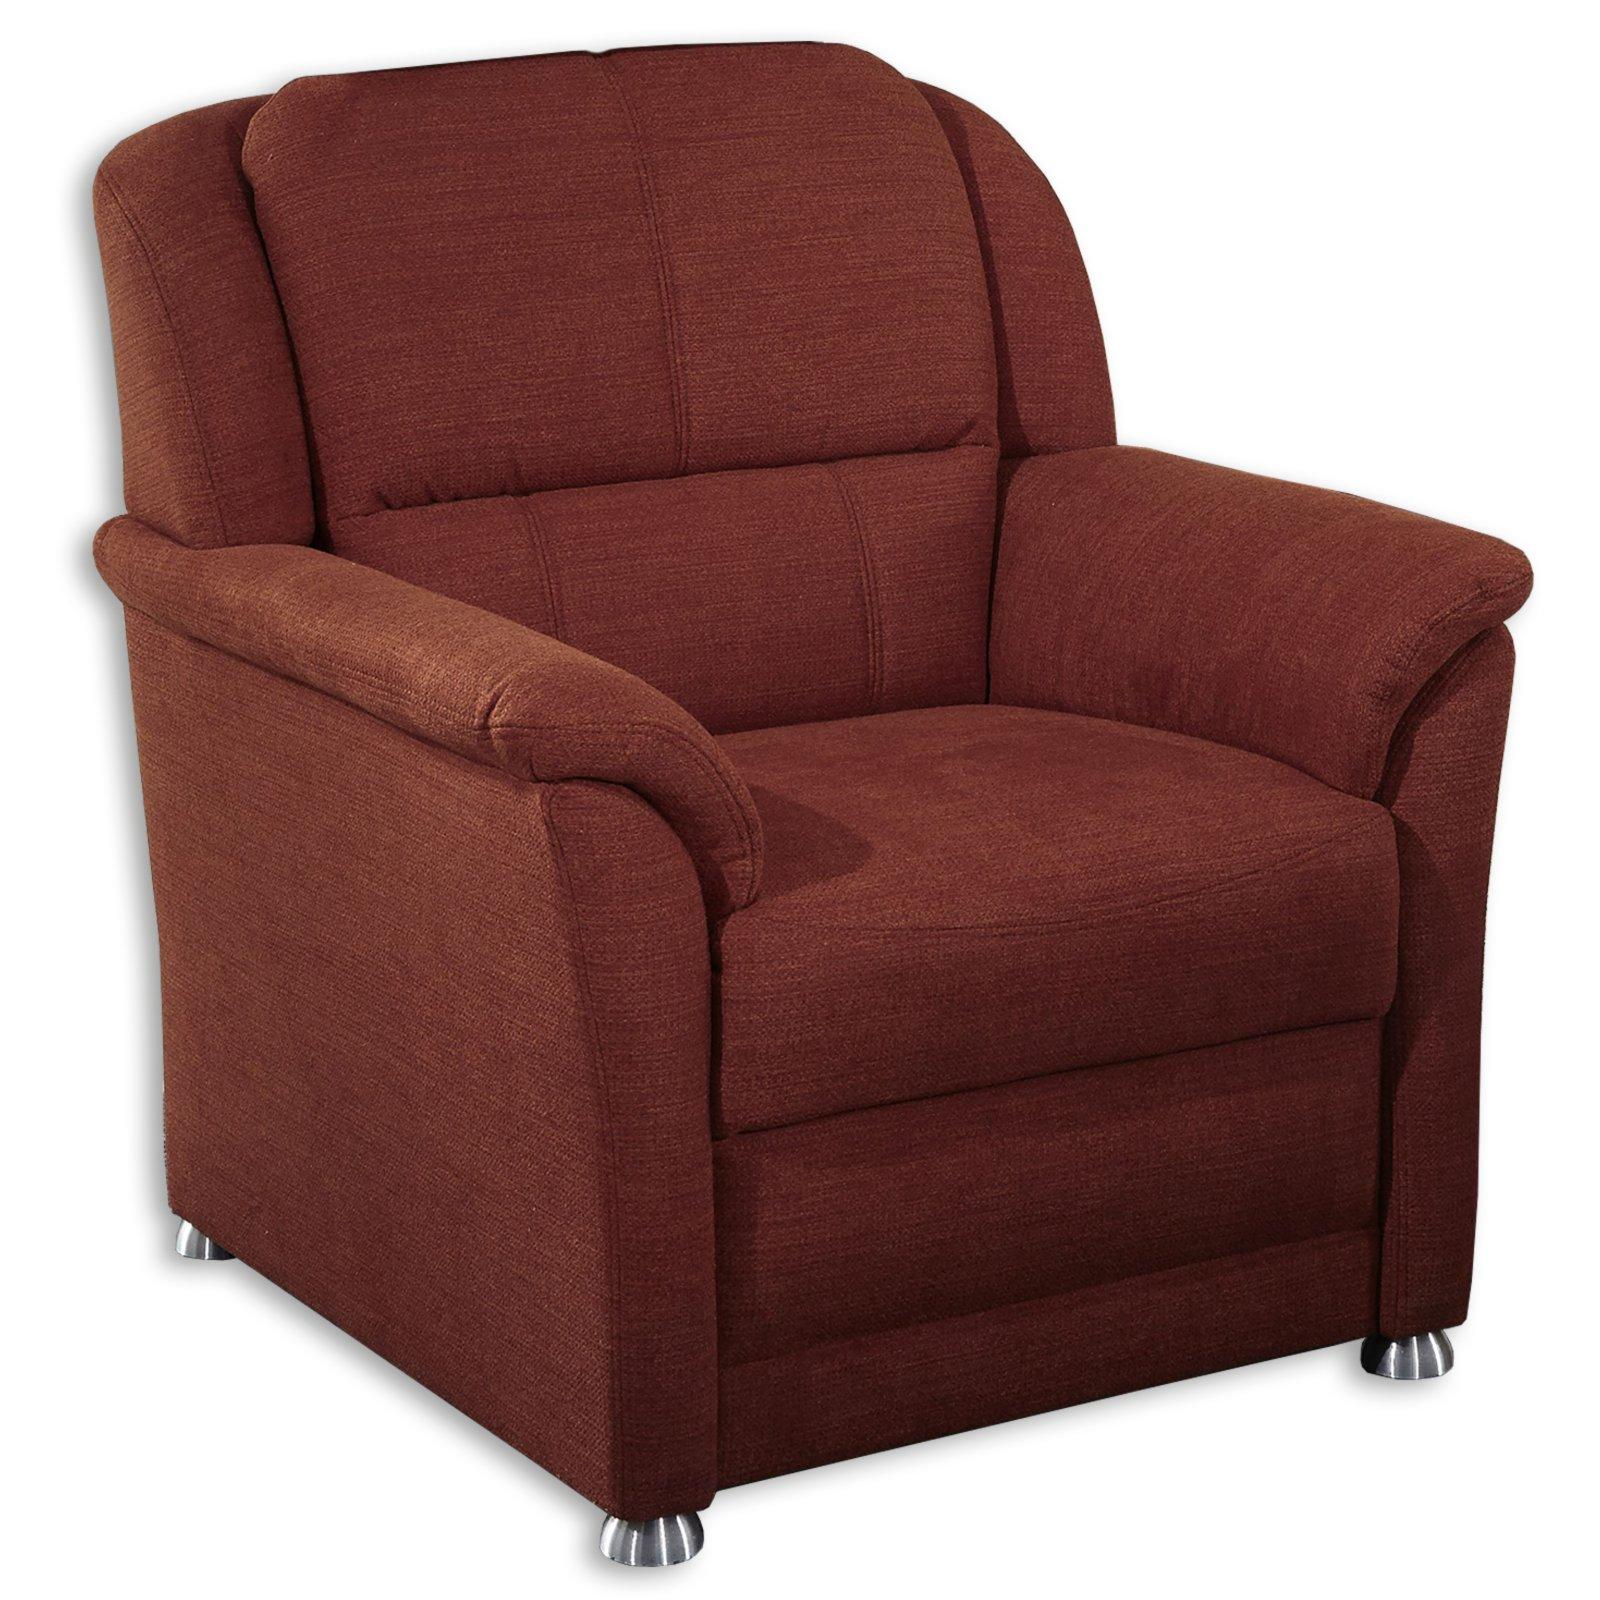 sessel rot federkern ebay. Black Bedroom Furniture Sets. Home Design Ideas